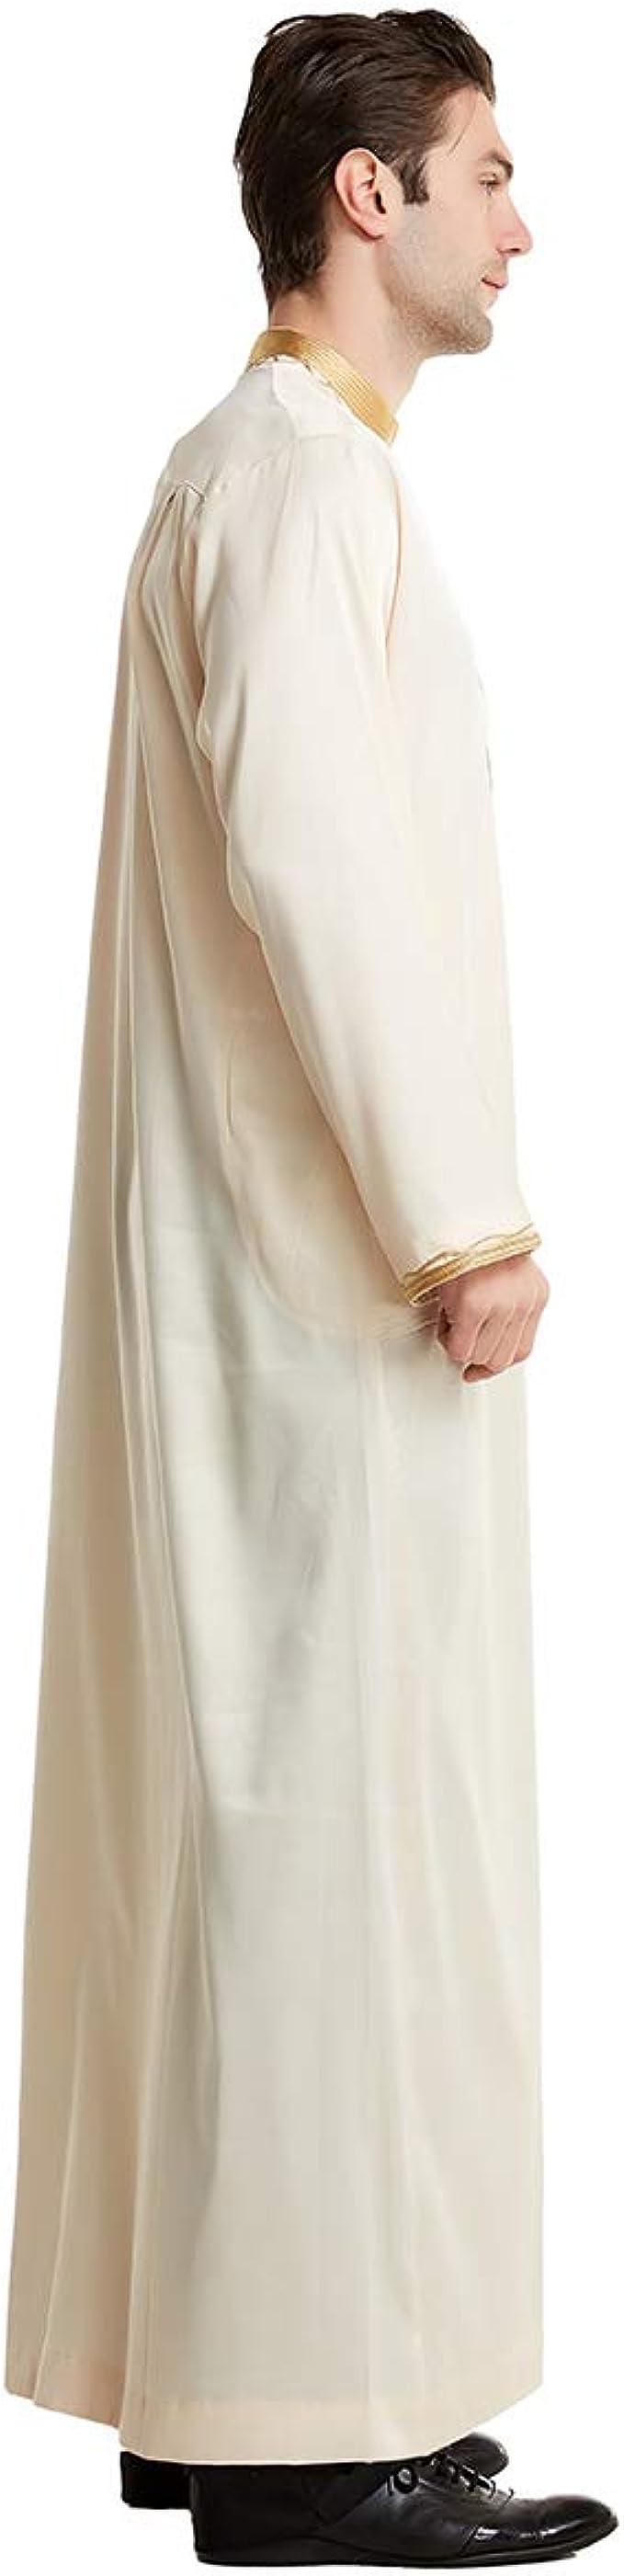 ONTBYB Mens Long Sleeve Arabic Abaya Muslim Middle East Arabian Robe